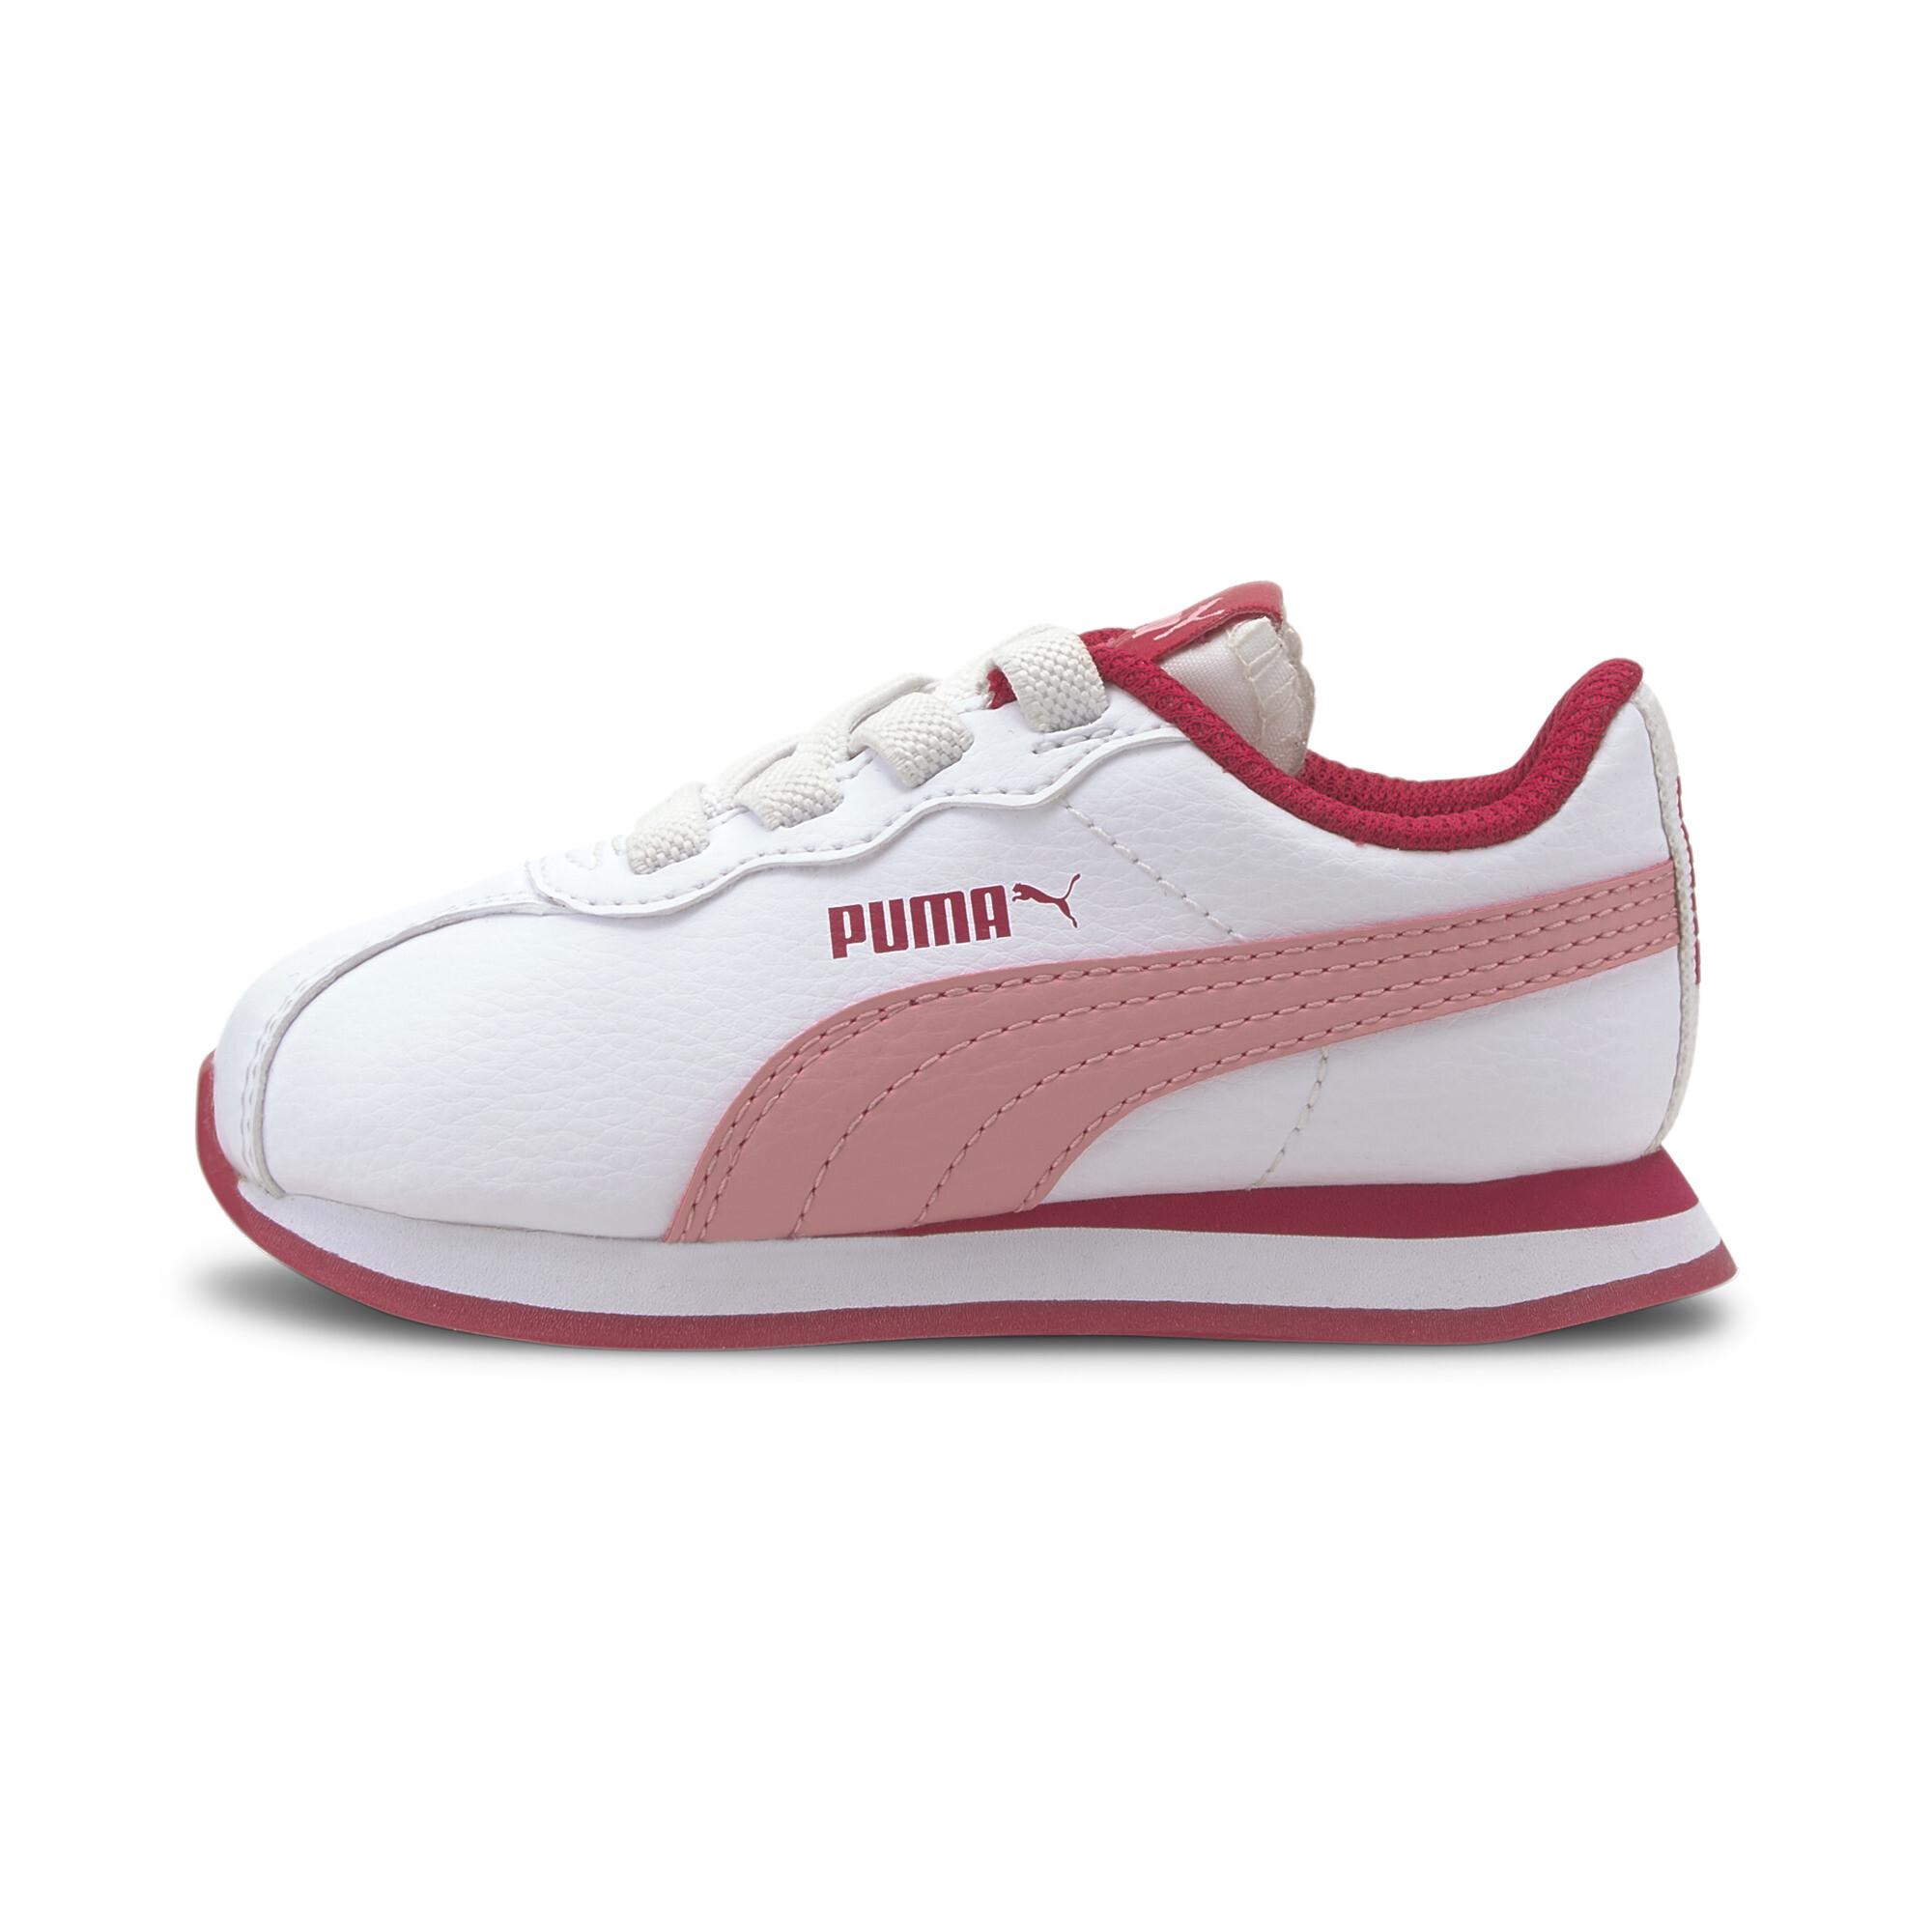 PUMA-Turin-II-AC-Toddler-Shoes-Unisex-Shoe-Kids thumbnail 19